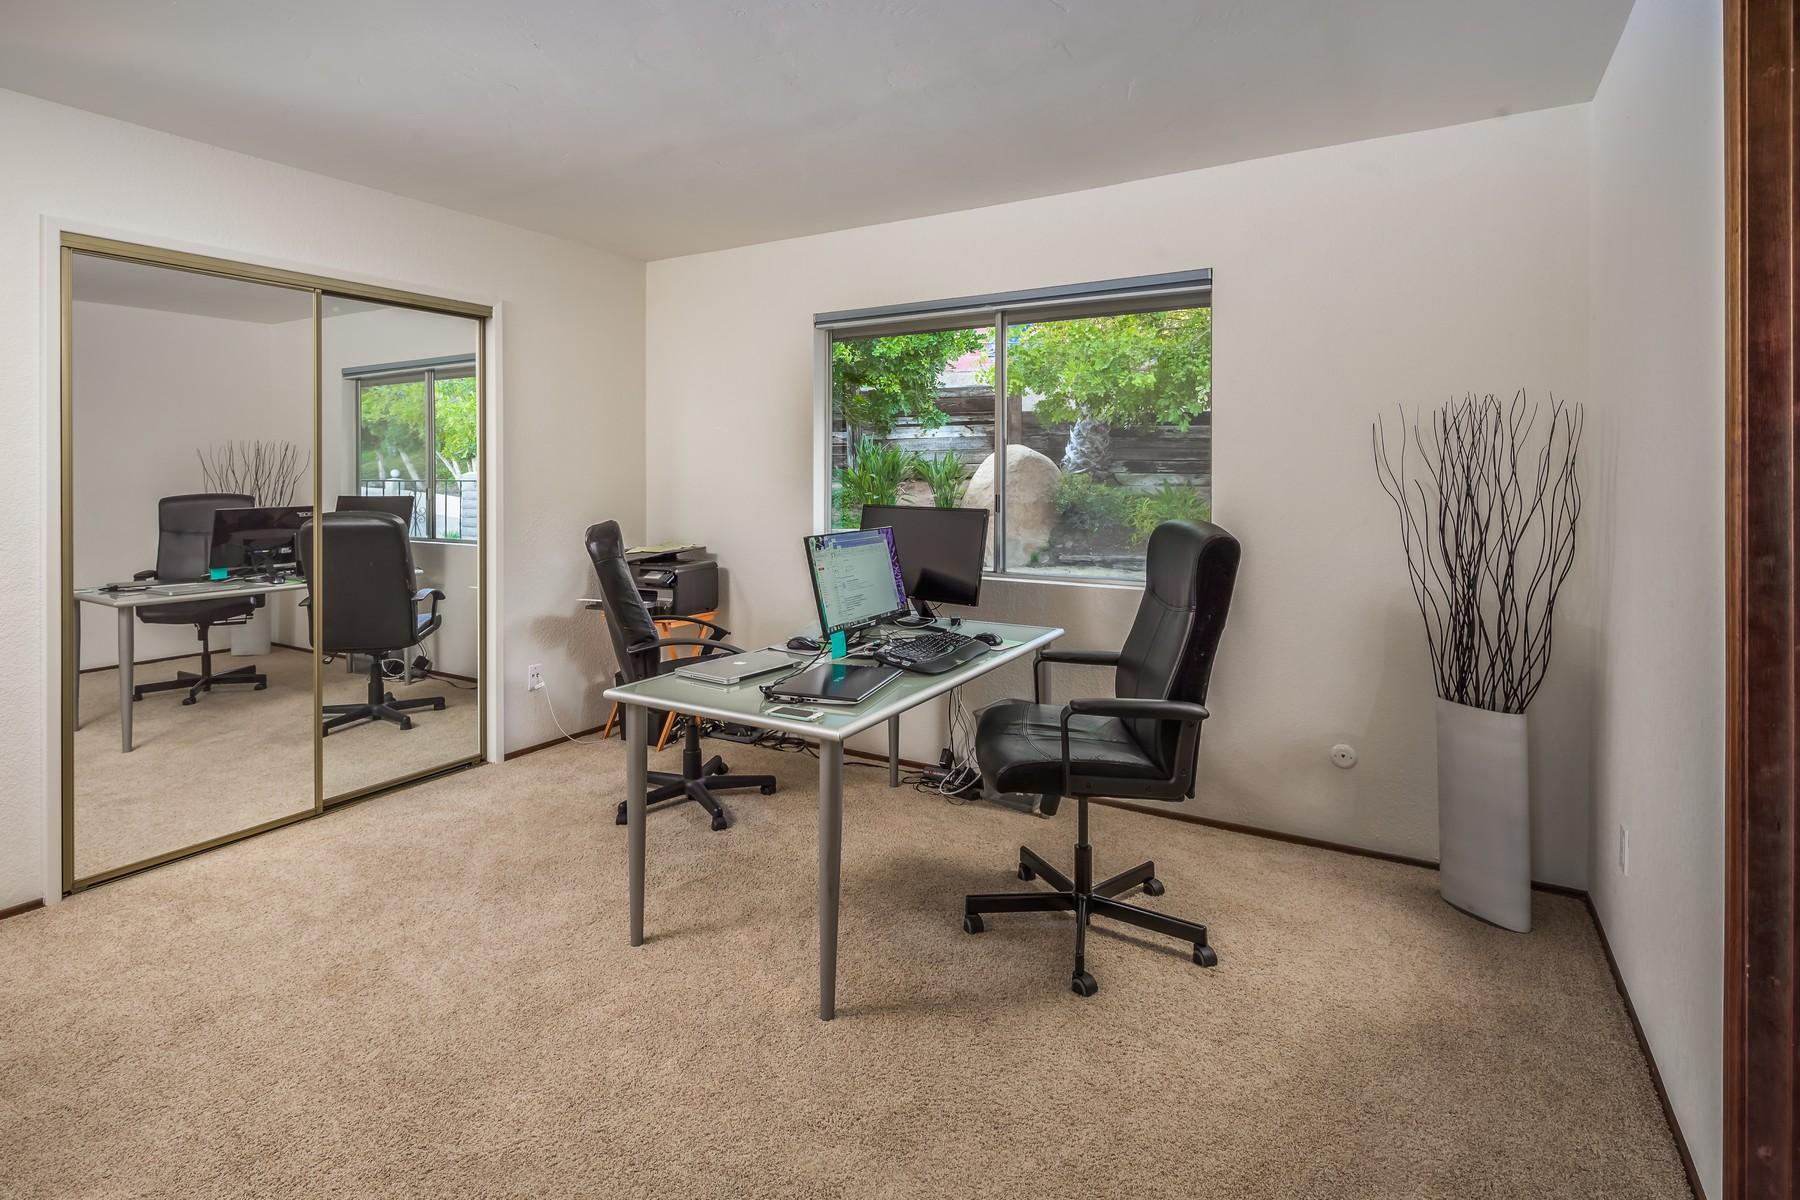 Additional photo for property listing at 4708 Gabriel Way  La Mesa, California 91941 Estados Unidos